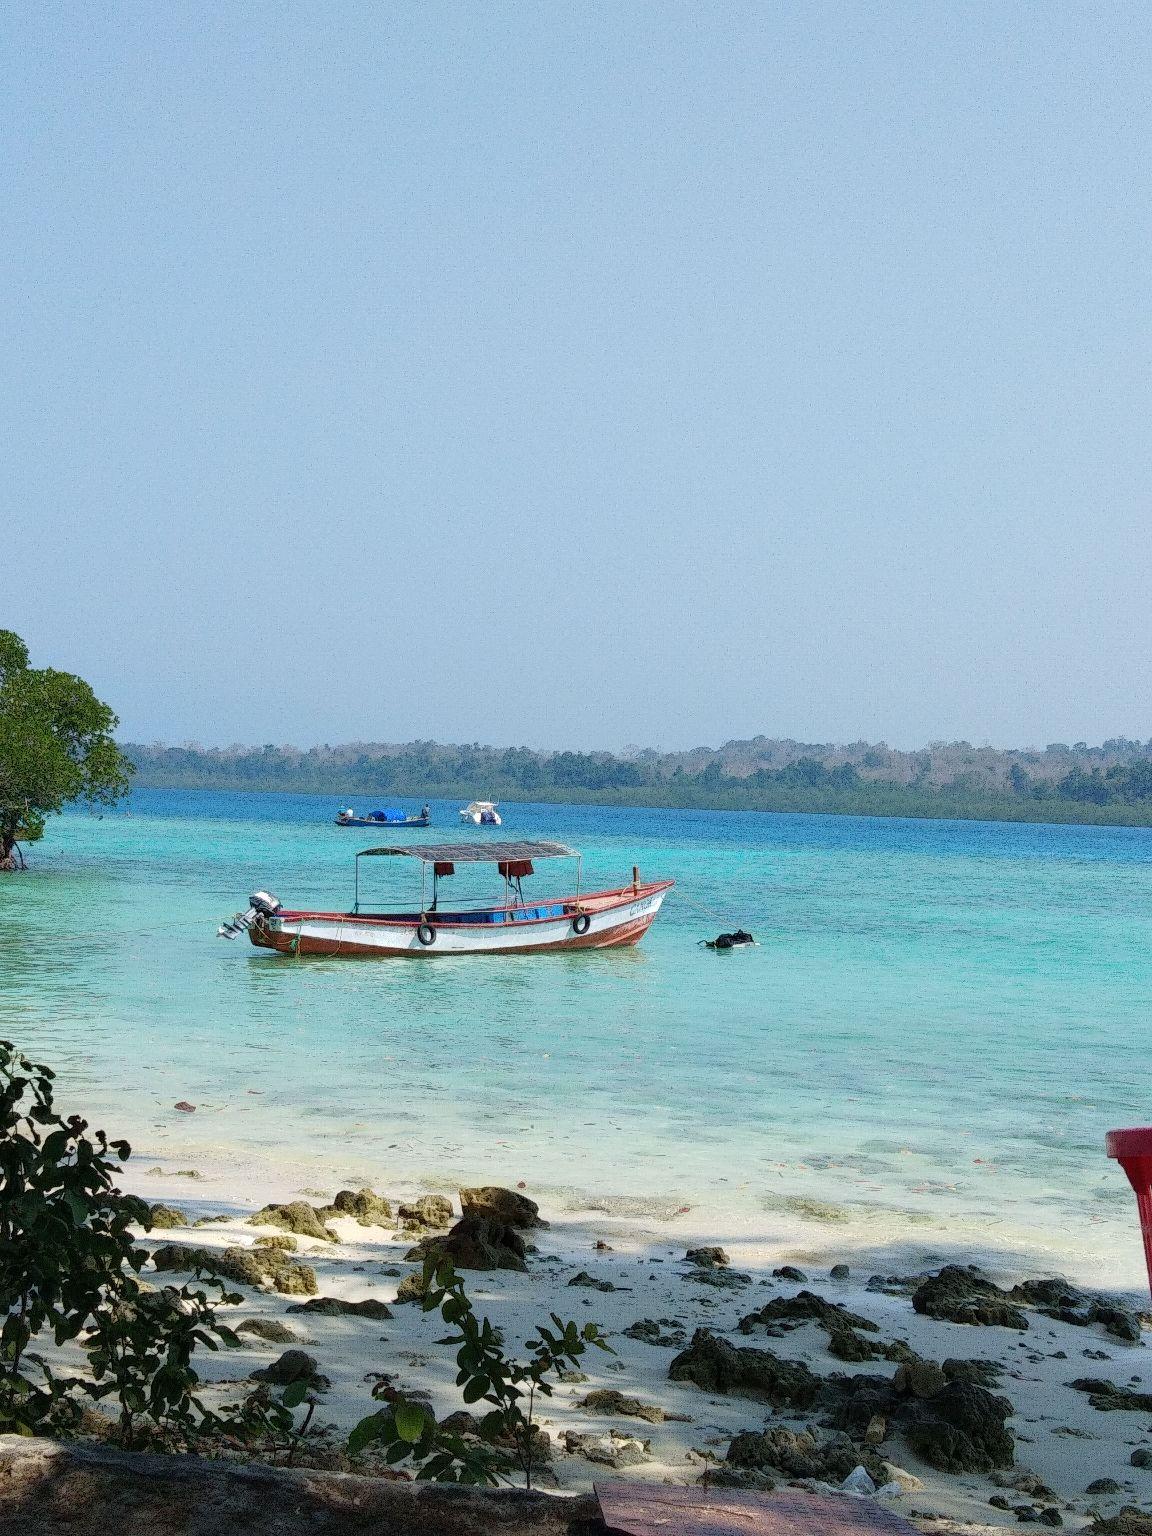 Photo of Havelock Island By Prabhat sharma